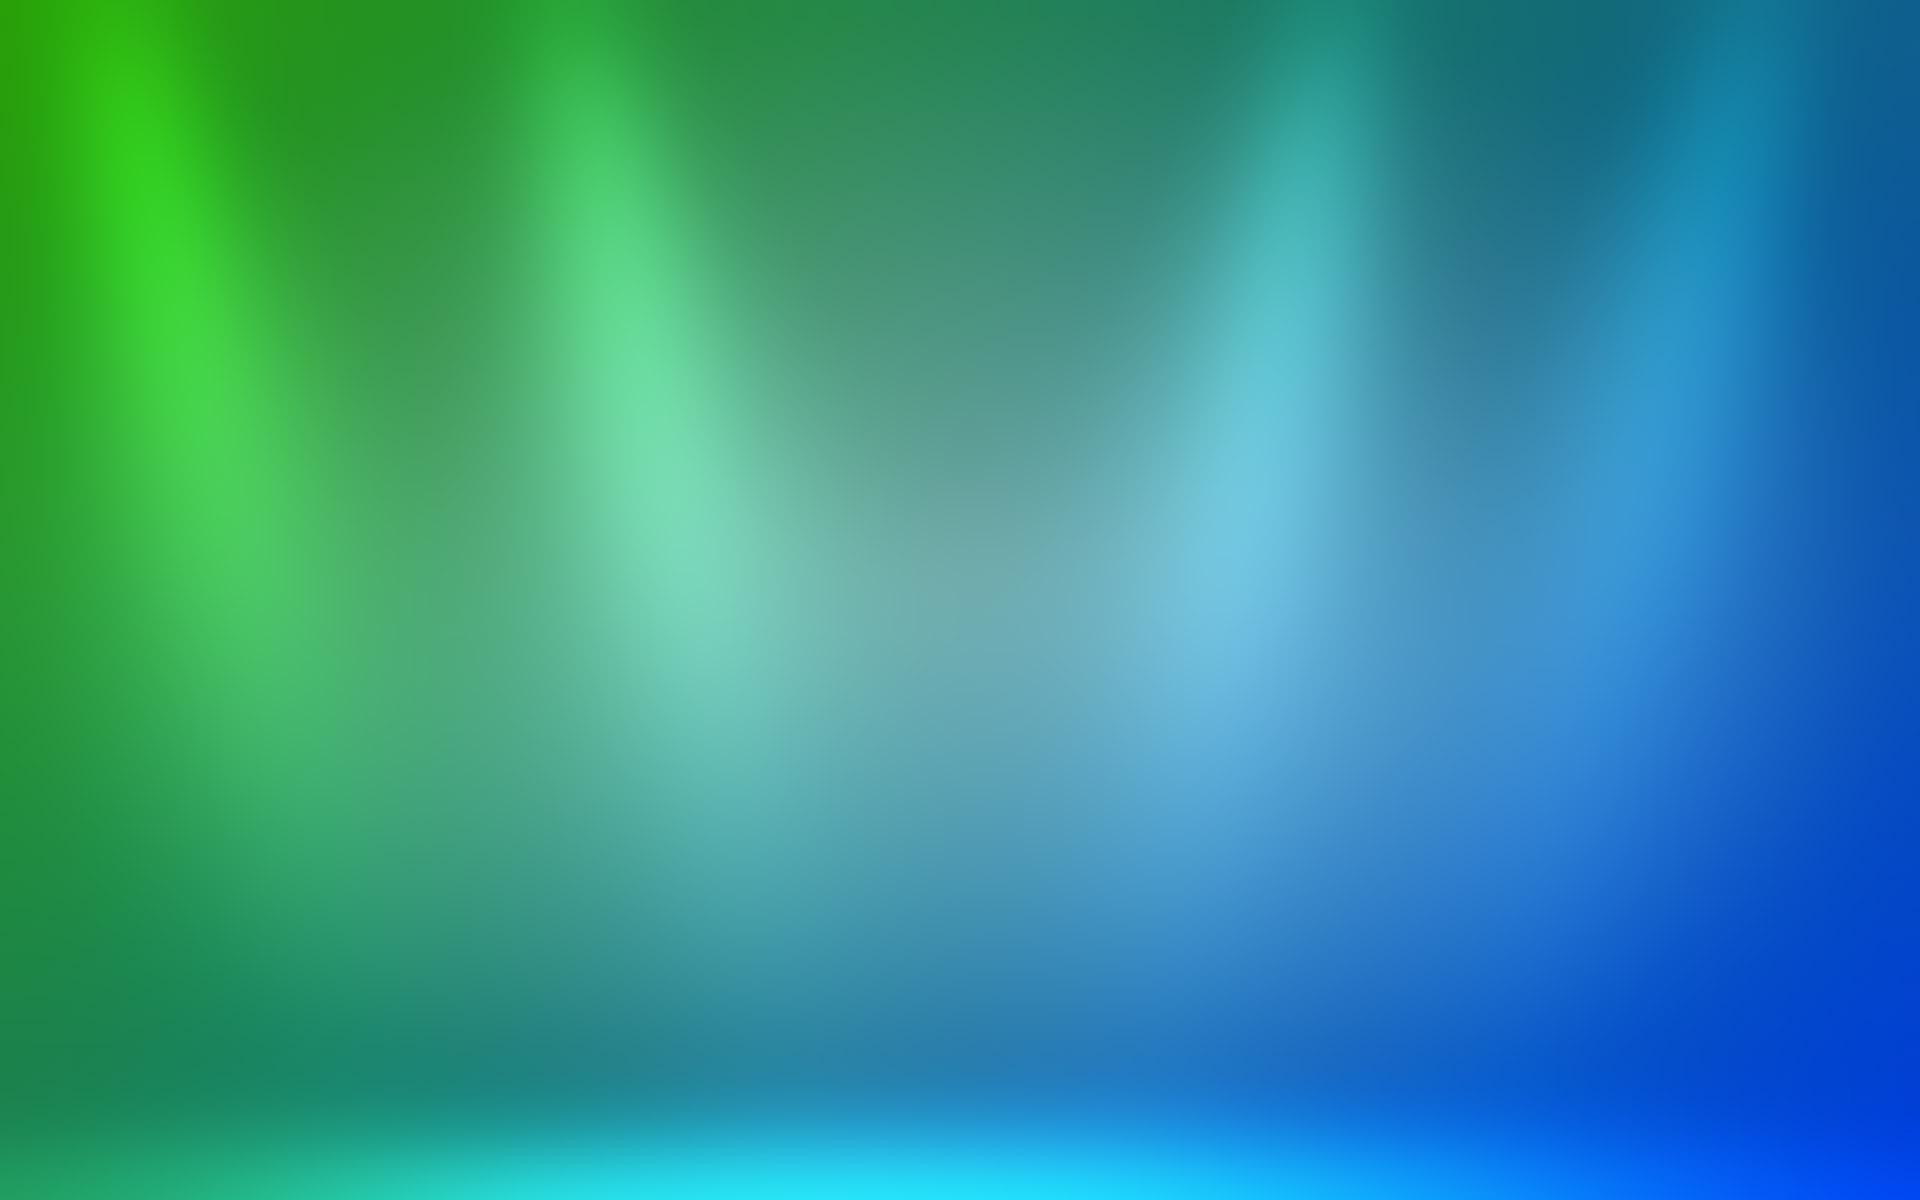 Green Blue Background wallpaper – 1189207